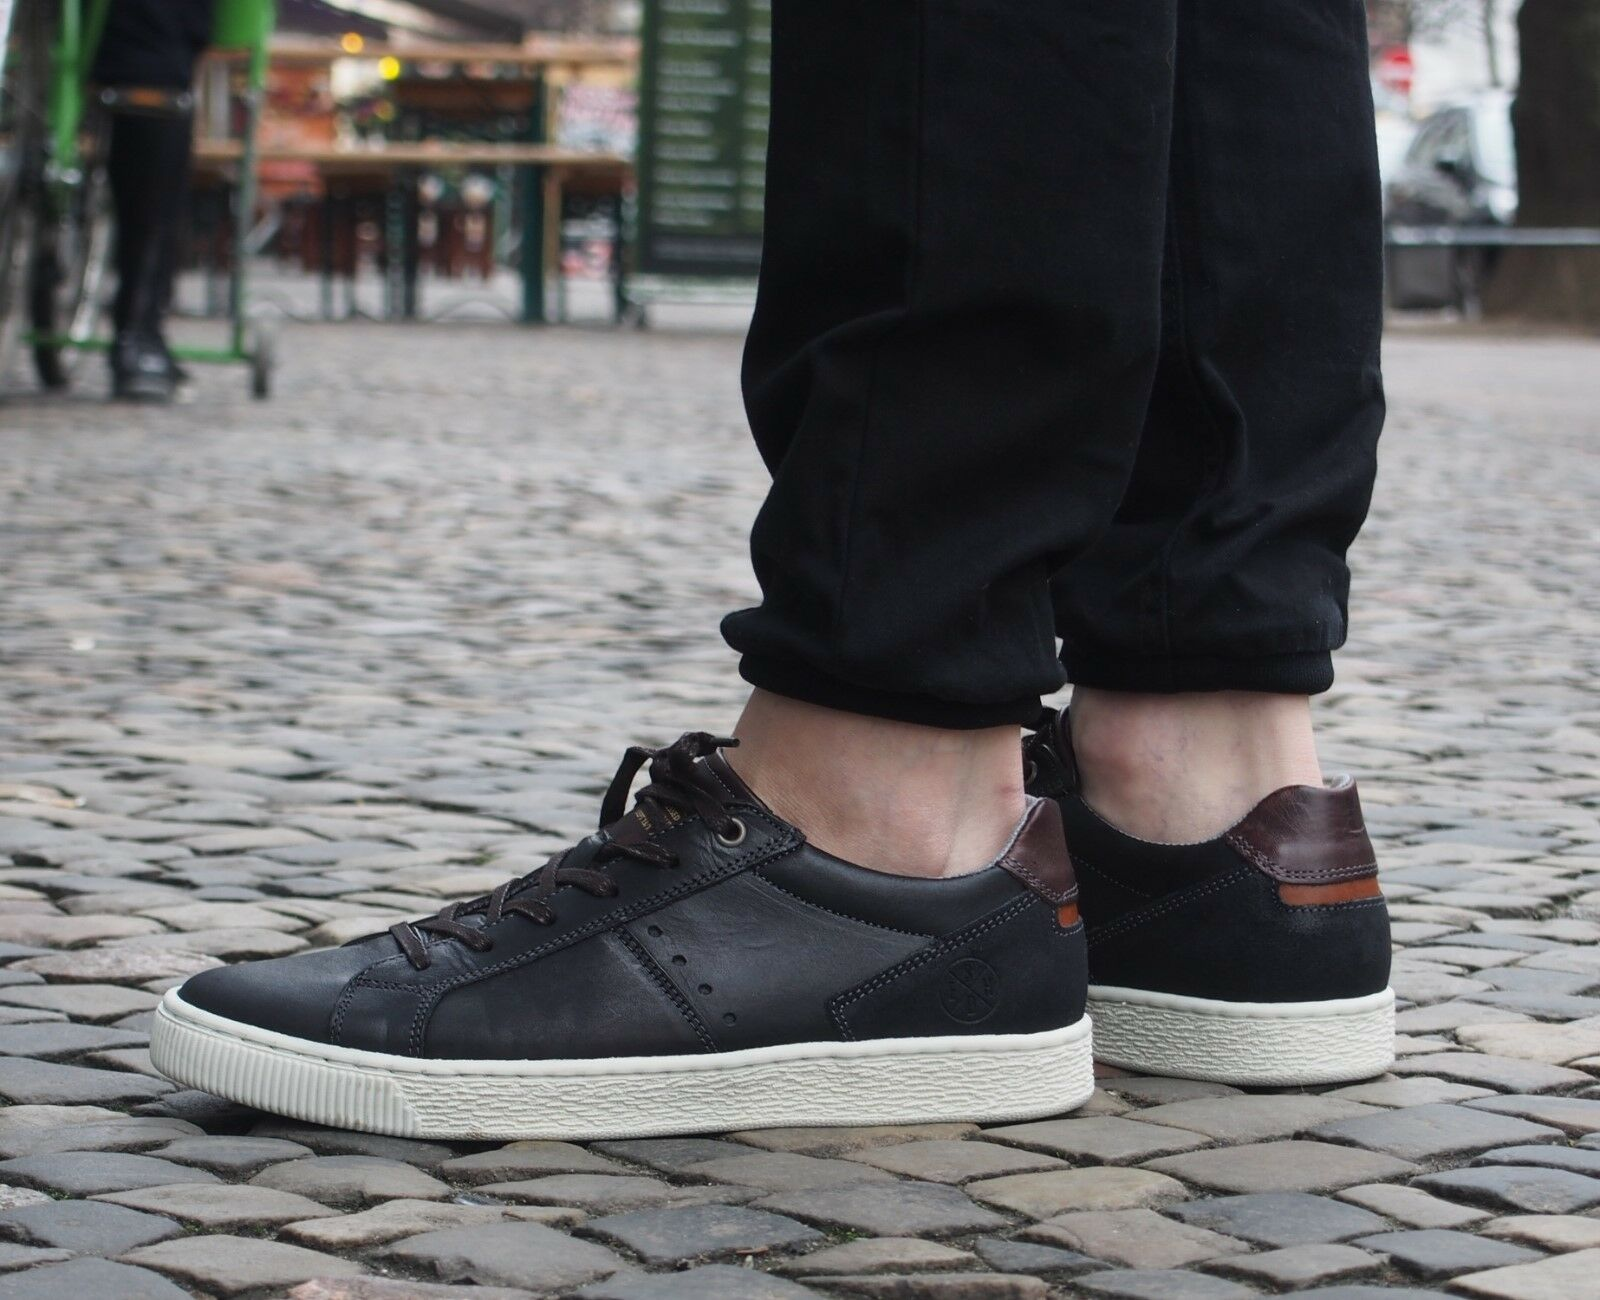 BULLBOXER Schuh Schnürschuh 33 schwarz black Echtleder Halbschuh Herrenschuh neu